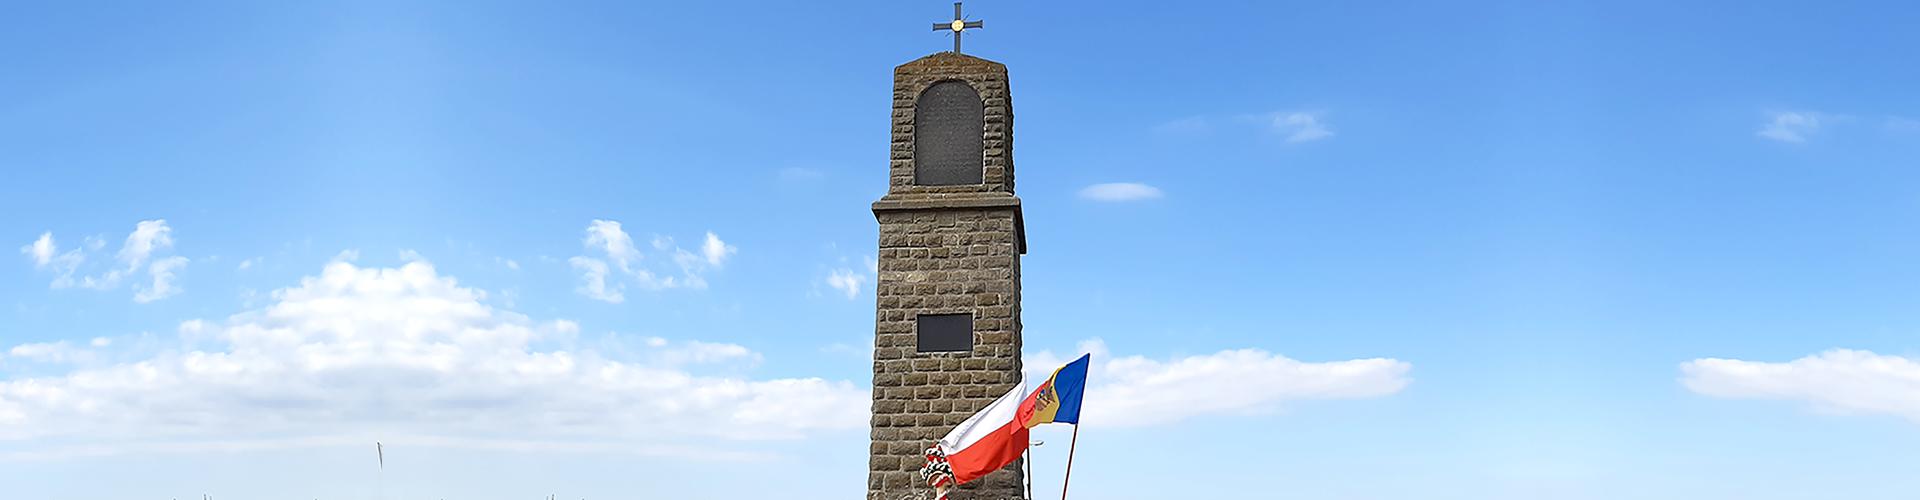 Polonia Moldawska